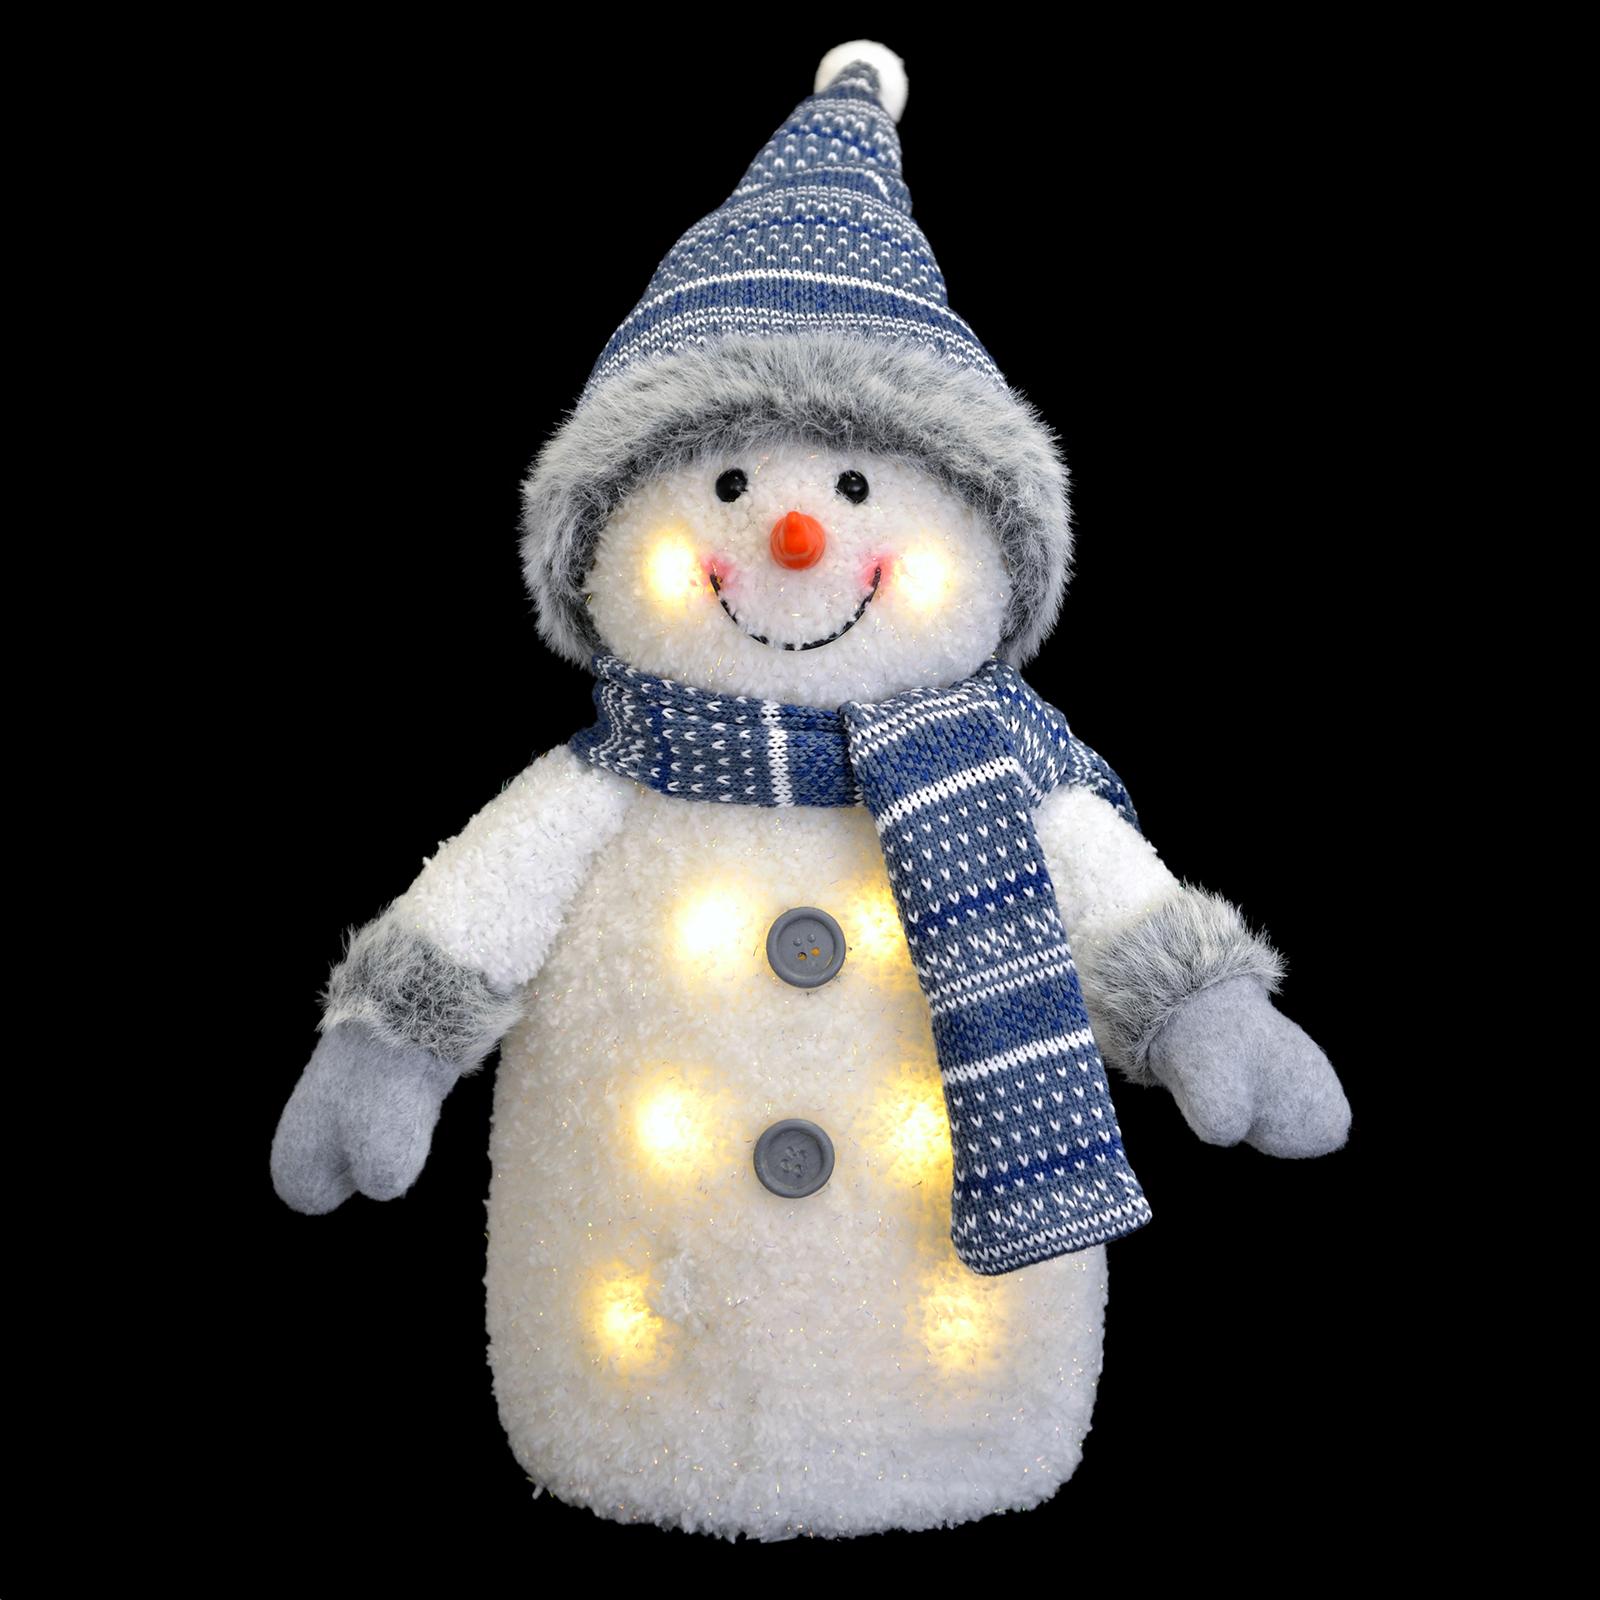 Blue white light up snowman christmas decoration with hat for Christmas snowman decorations